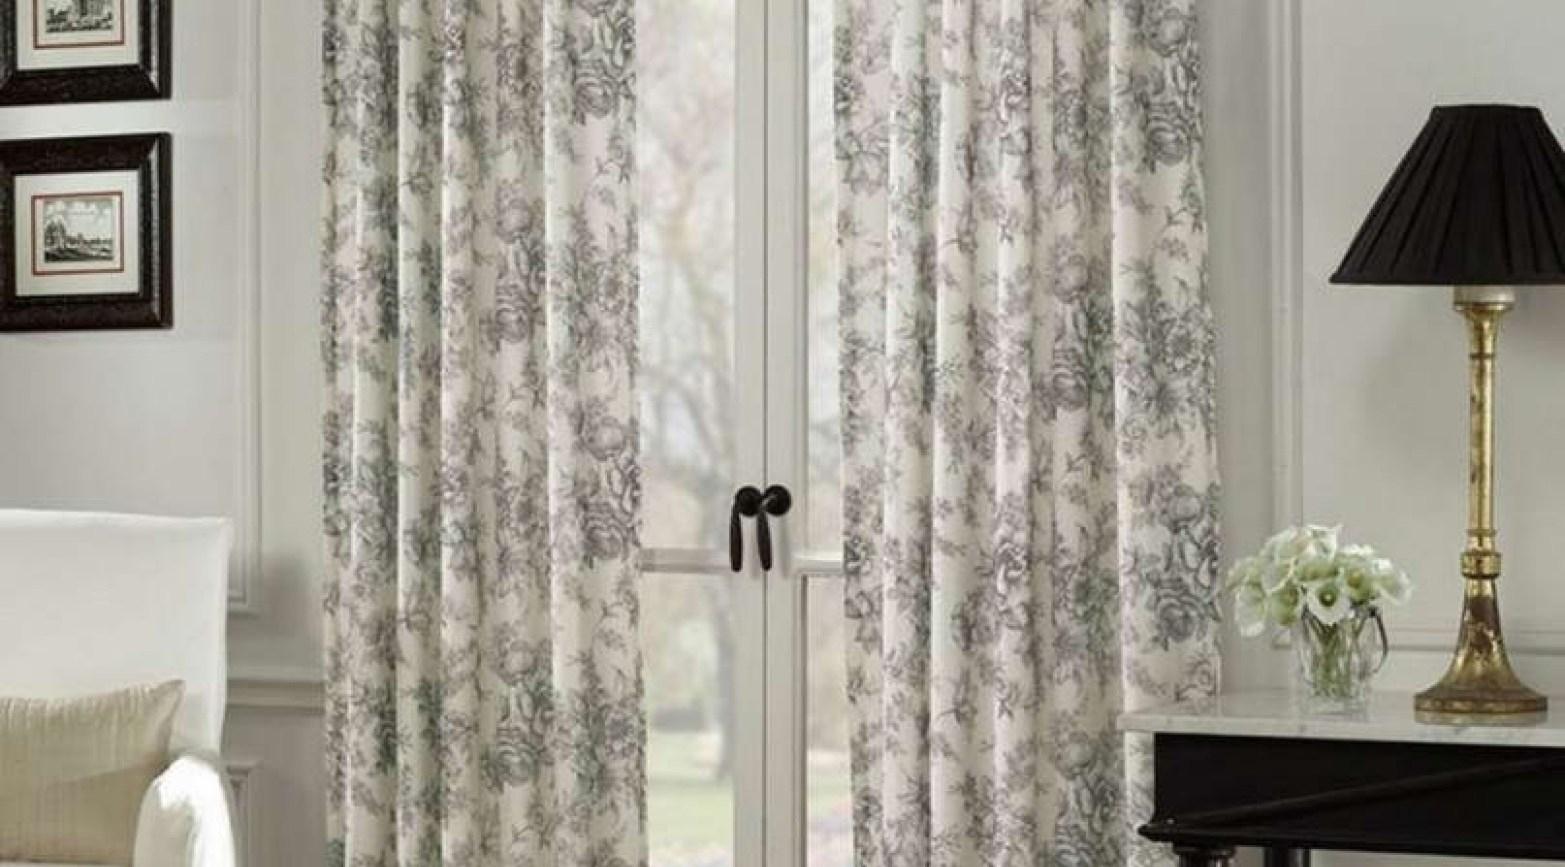 Standard Sliding Glass Door Curtain Size